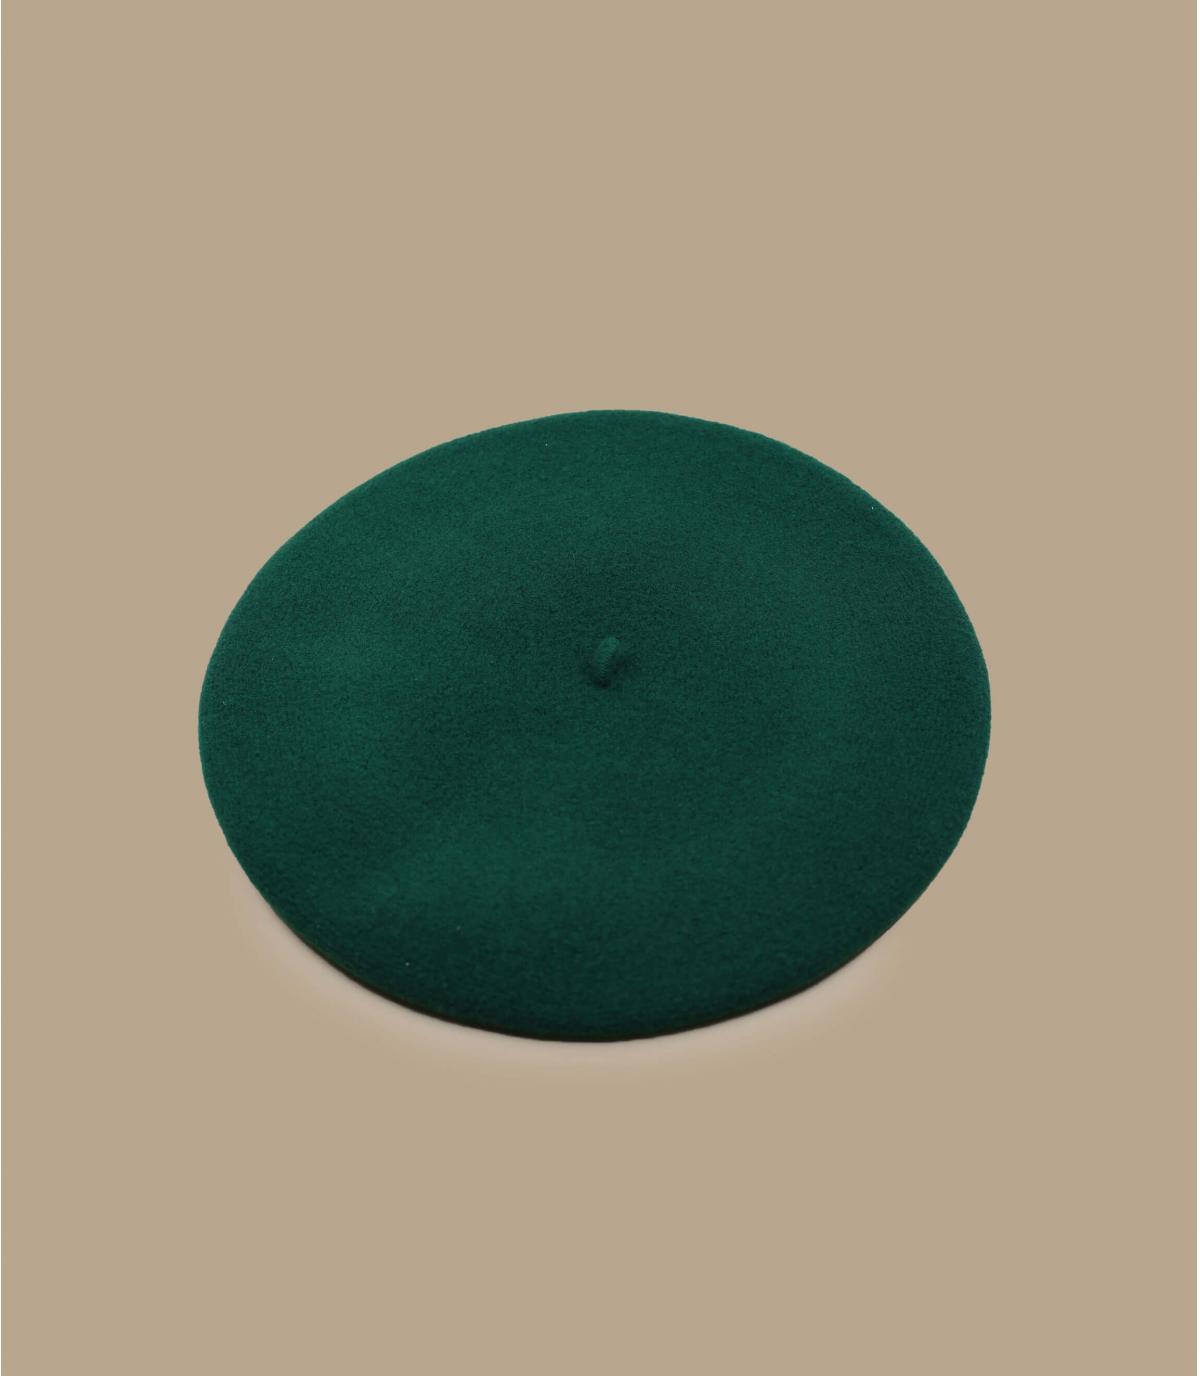 Laulhère groene baret